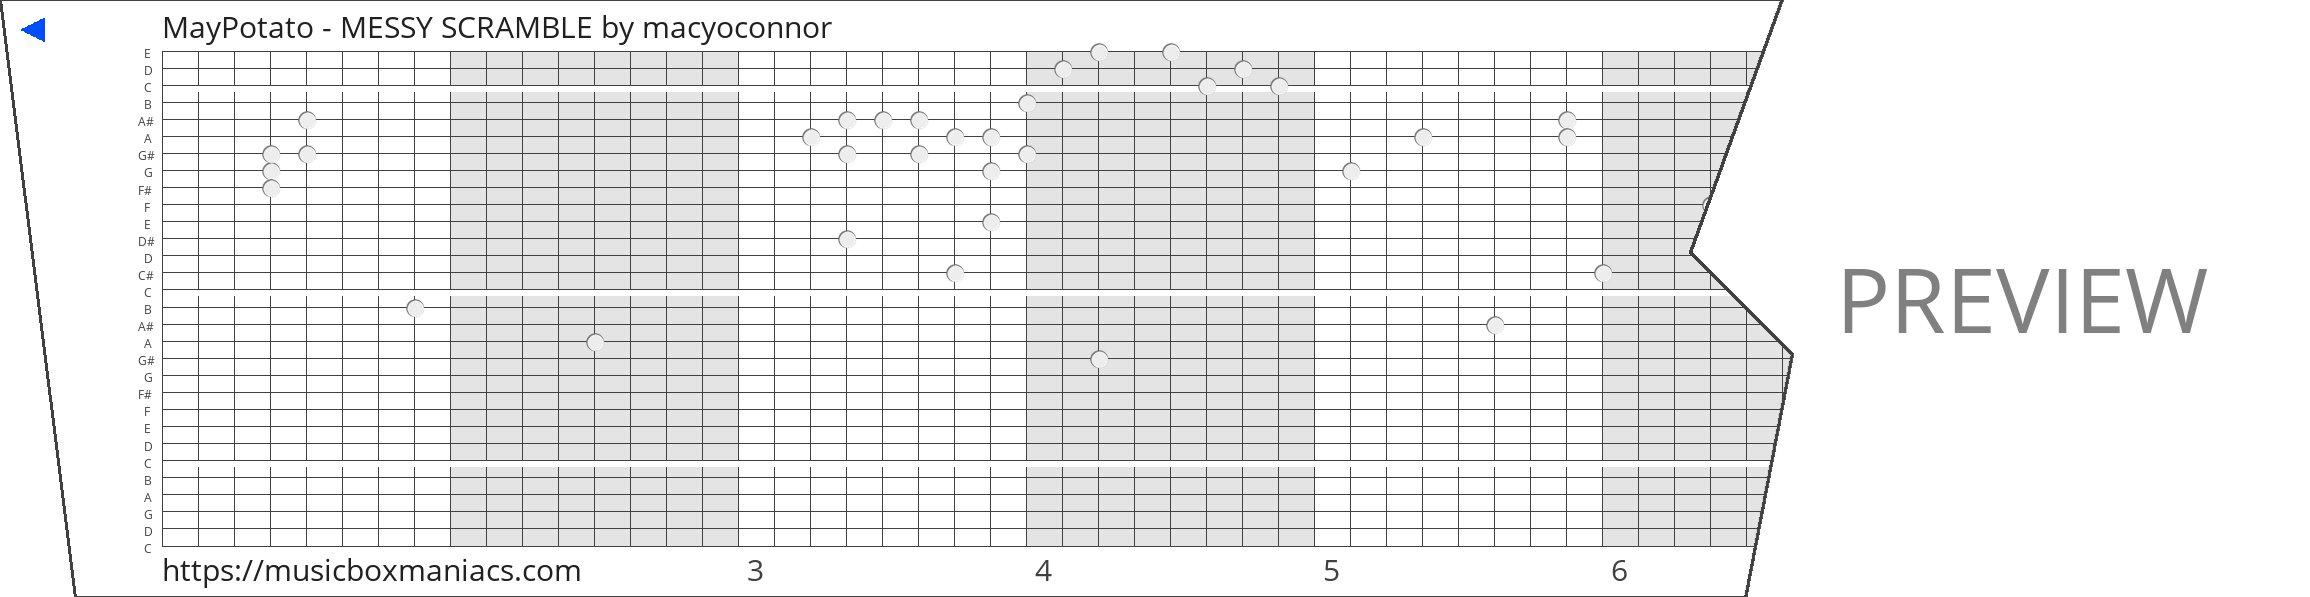 MayPotato - MESSY SCRAMBLE 30 note music box paper strip